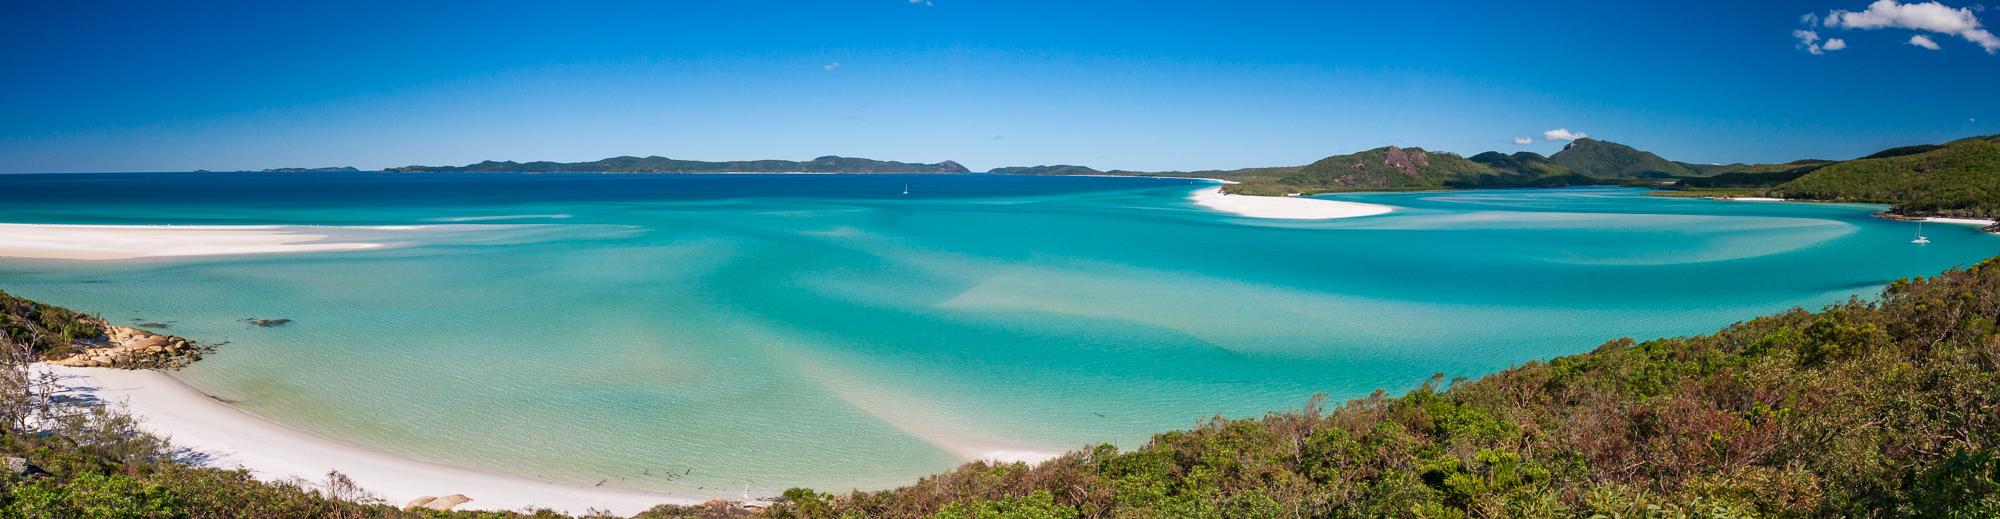 Whiteheaven Beach Australien Panorama